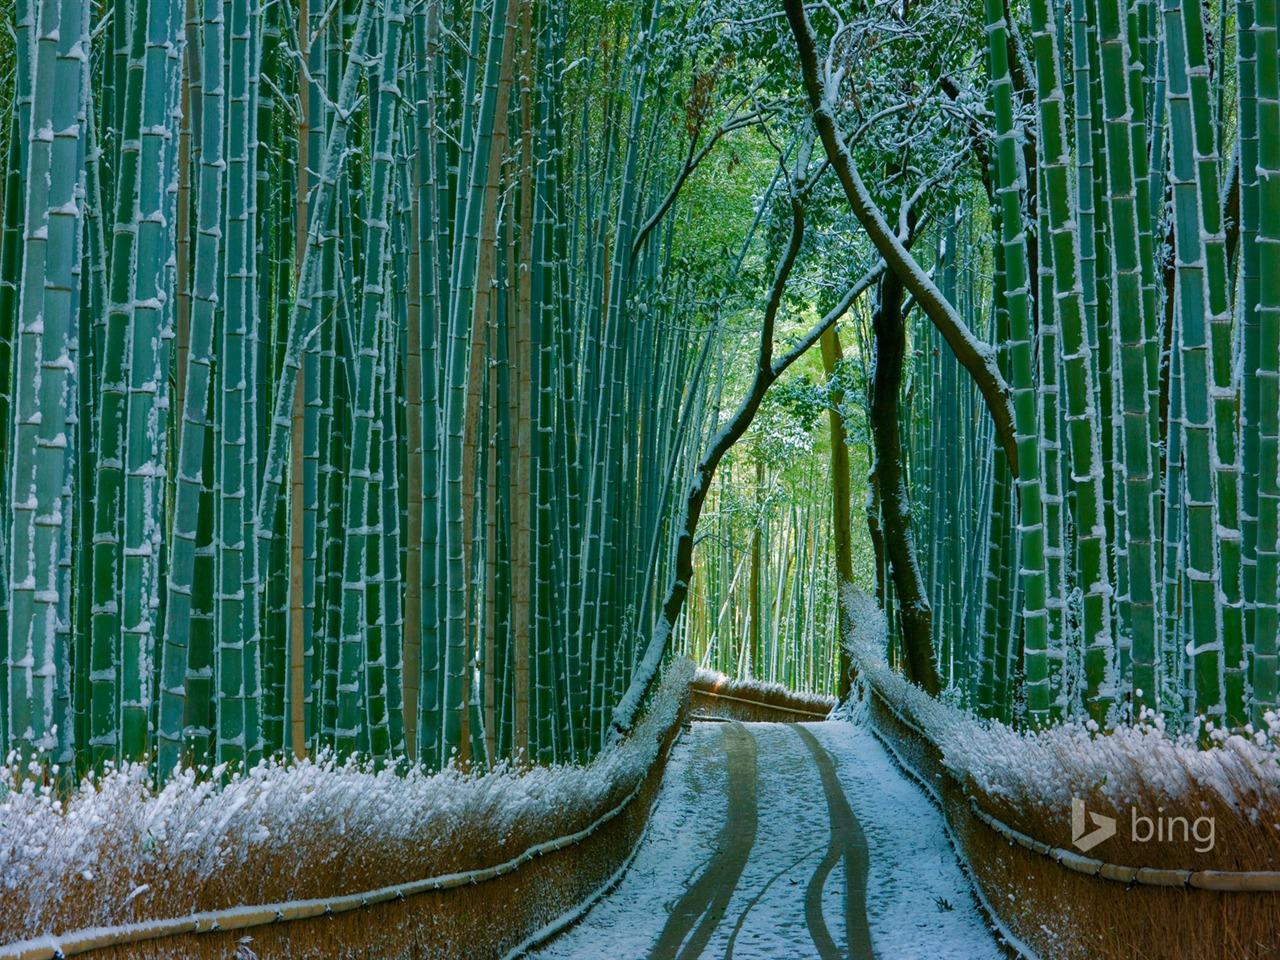 Japan Bamboo Forest Arashiyama-2016 Bing Desktop Wallpaper ...